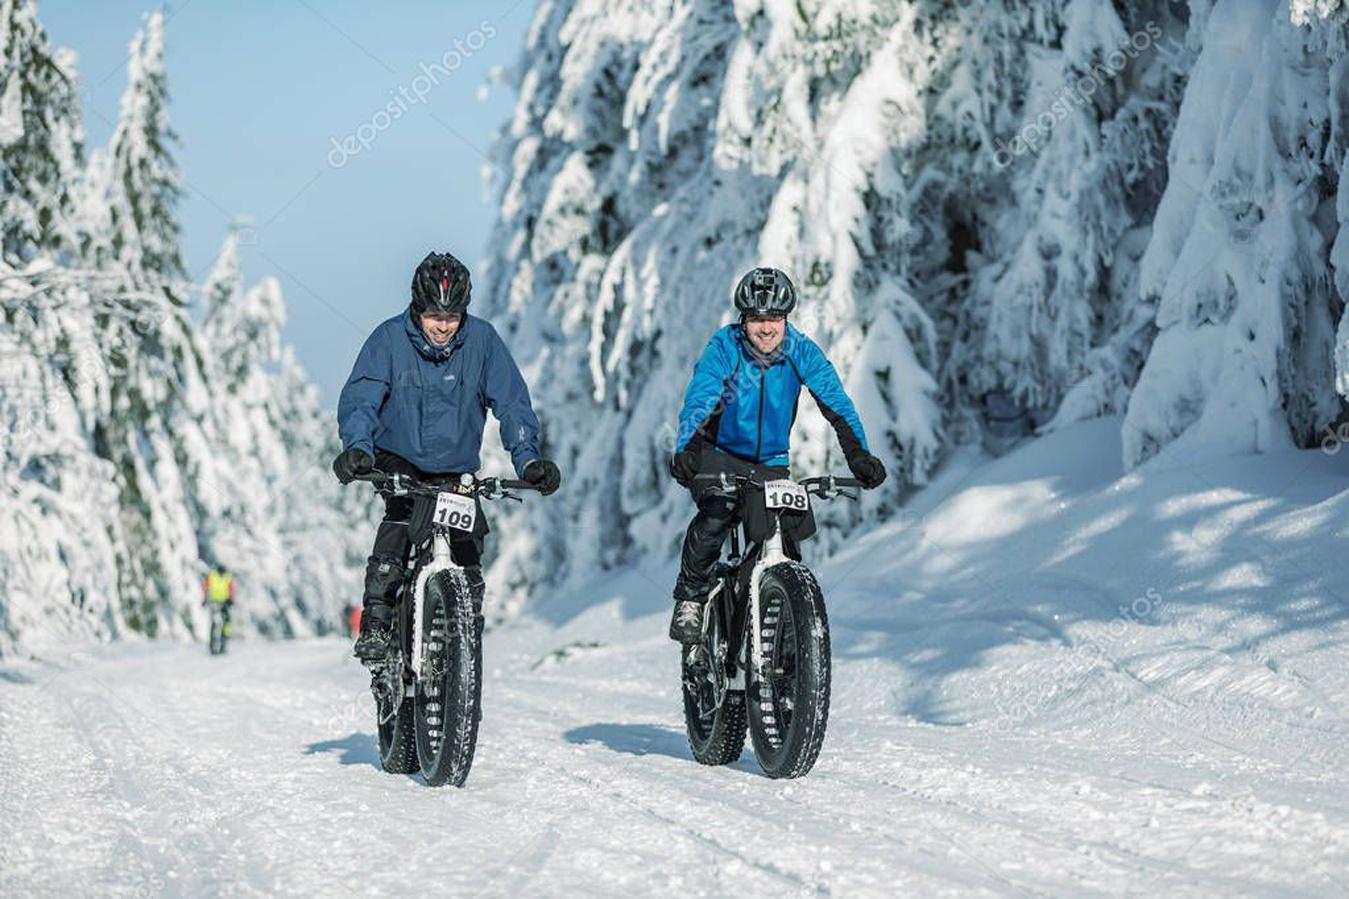 depositphotos_243409992-stock-photo-orlicke-hory-january-2019-two